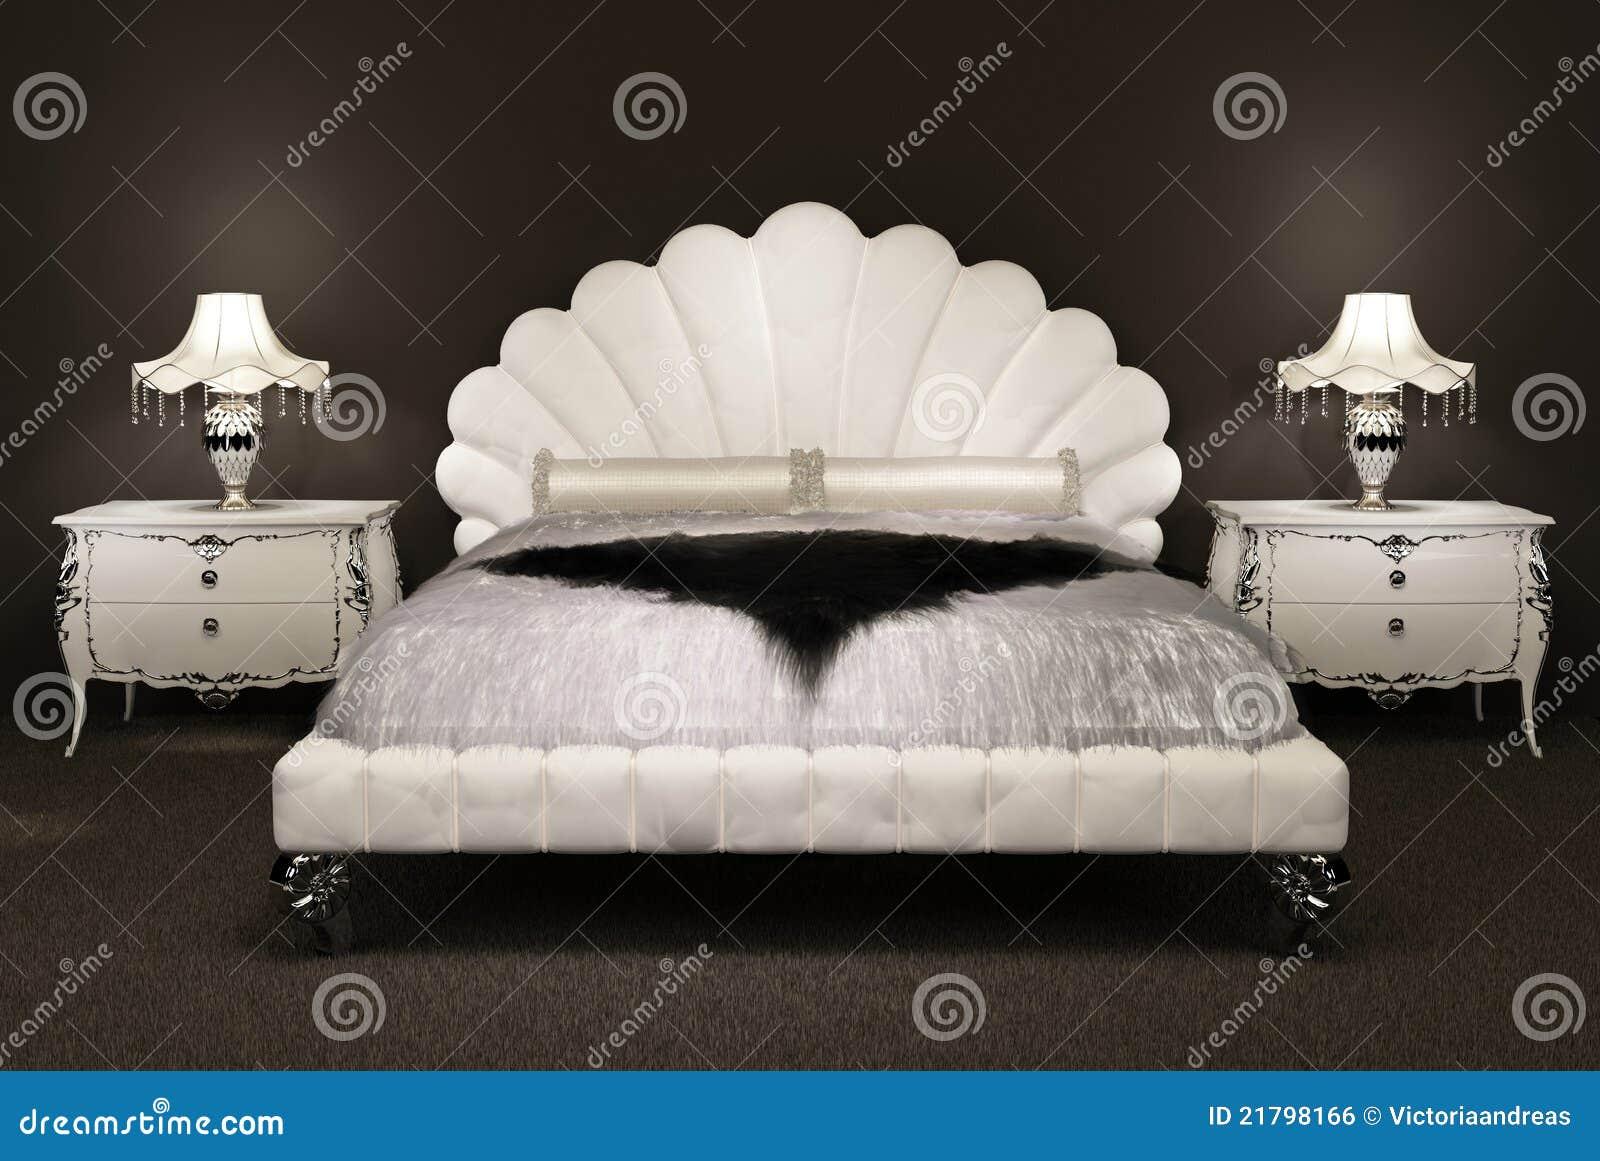 modernes bett mit pelzbettdecke lizenzfreies stockbild bild 21798166. Black Bedroom Furniture Sets. Home Design Ideas